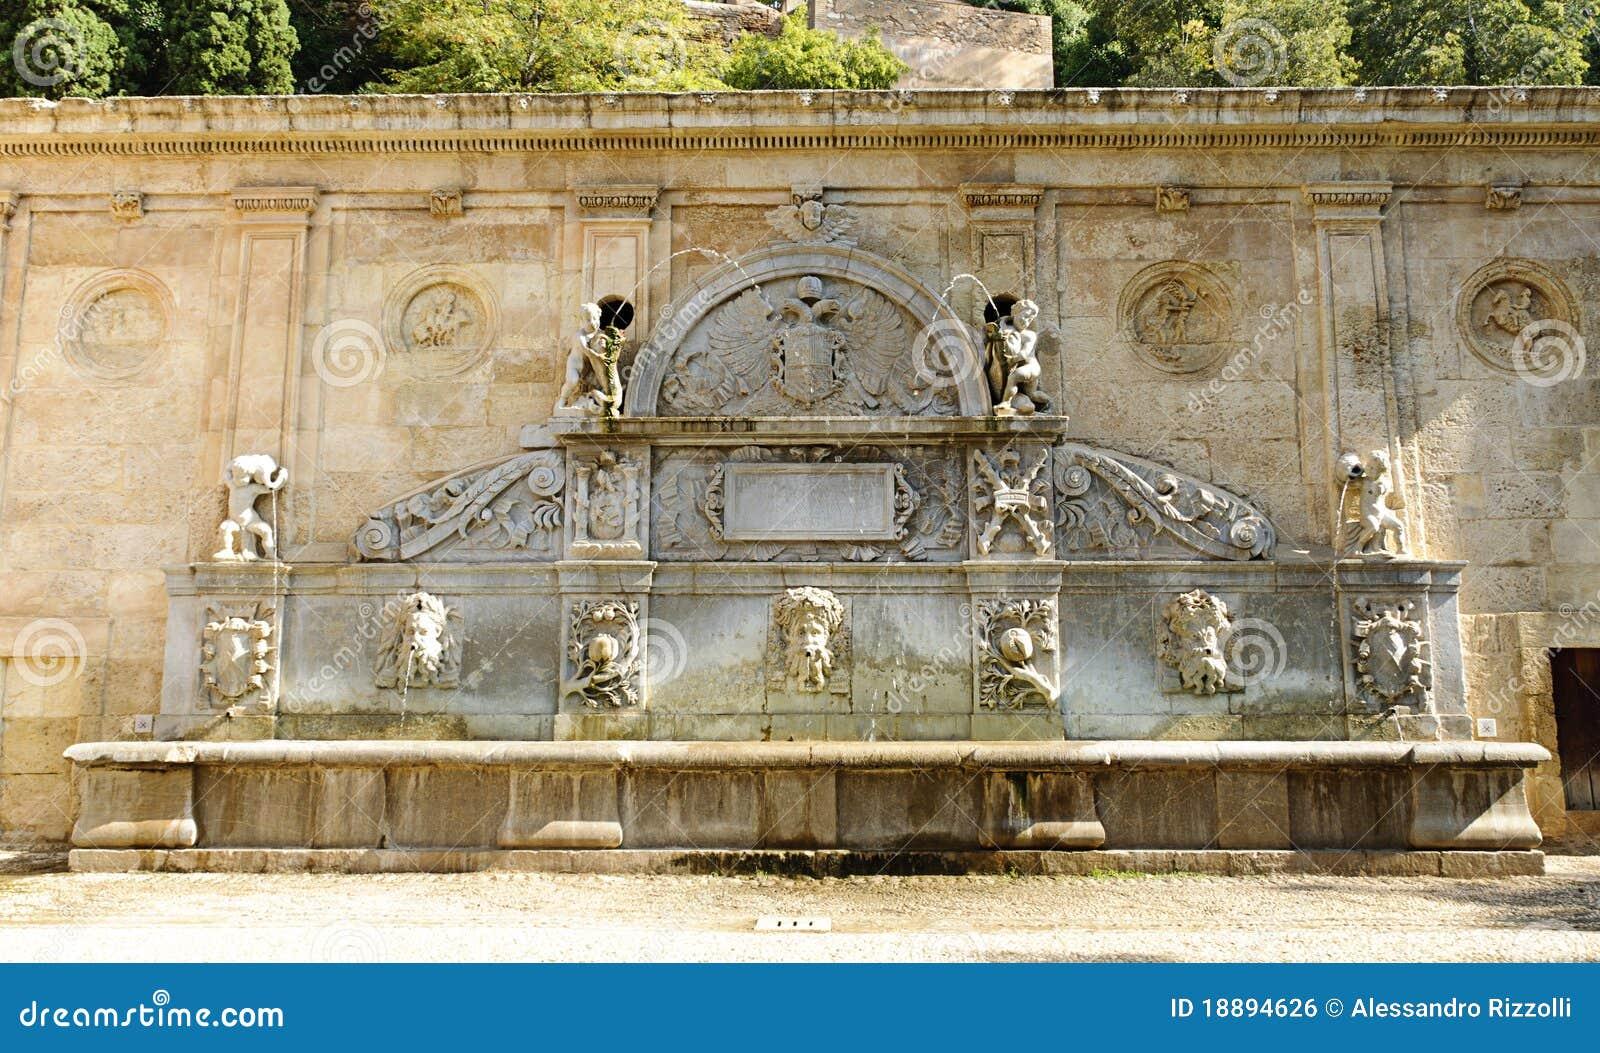 electrical plan switch symbol electrical plan kitchen pilar de carlos v fountain in granada royalty free stock